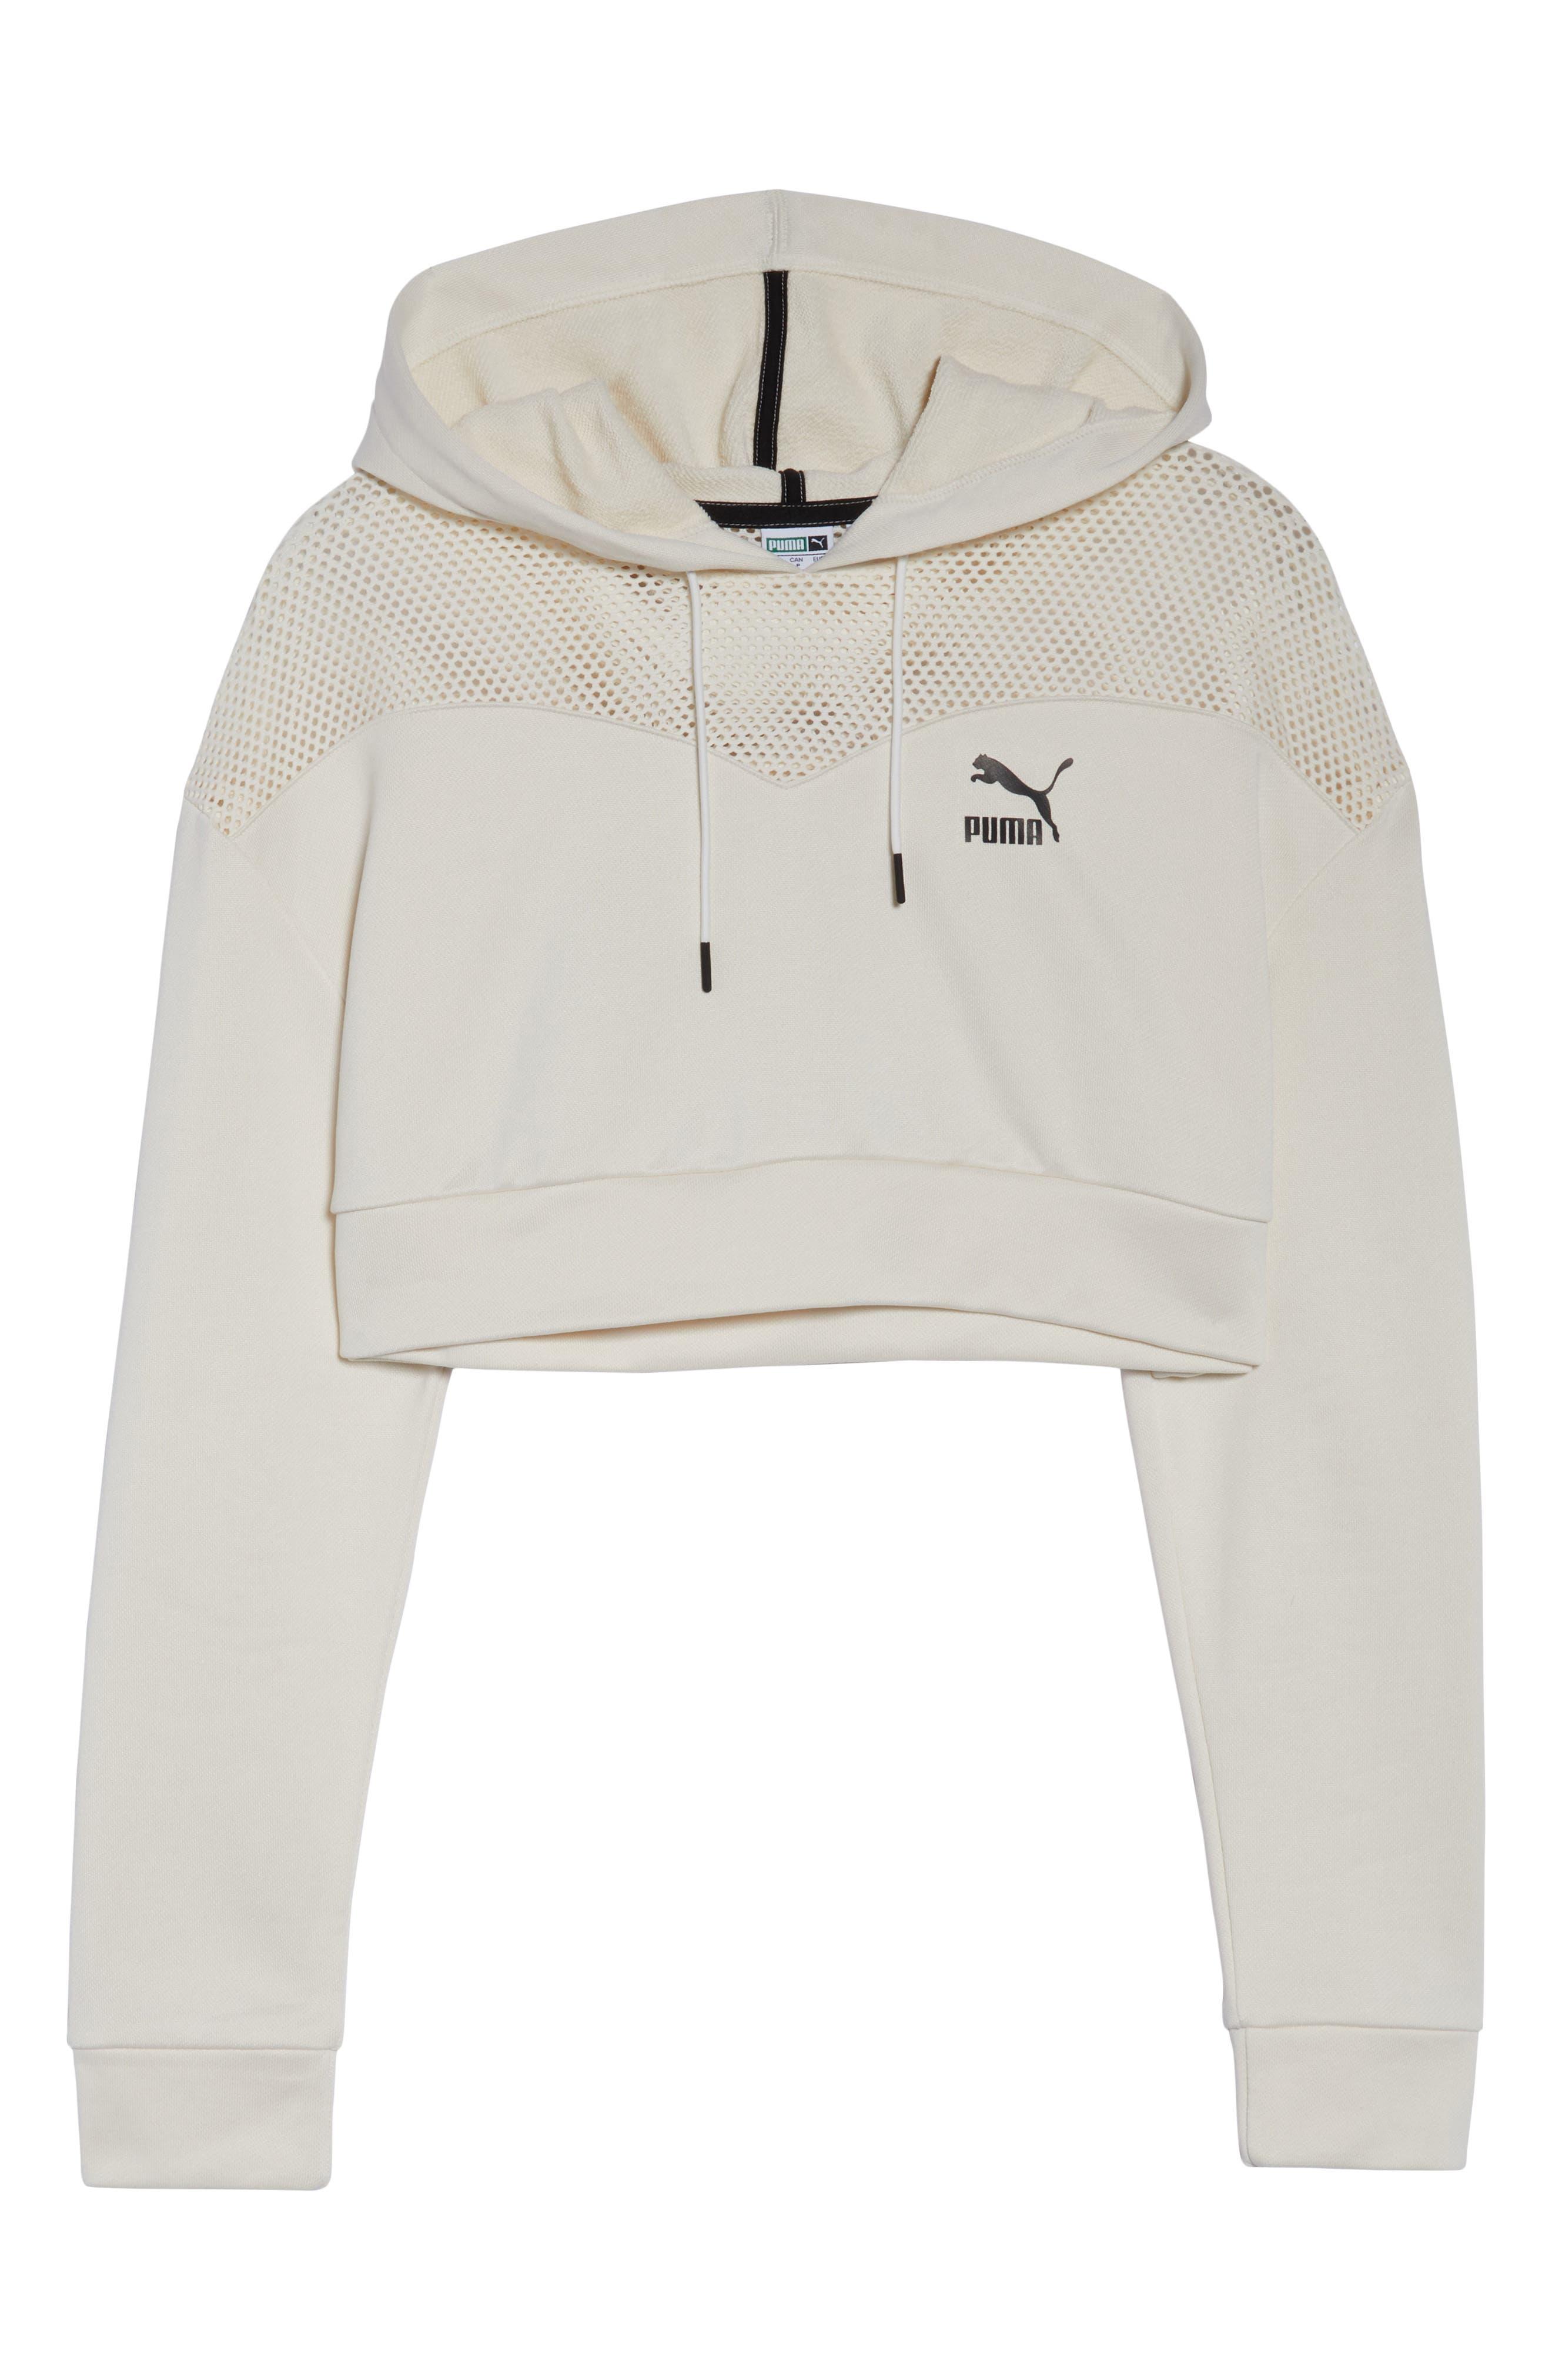 PUMA, Flourish Crop Hooded Sweatshirt, Alternate thumbnail 7, color, WHISPER WHITE-PUMA BLACK